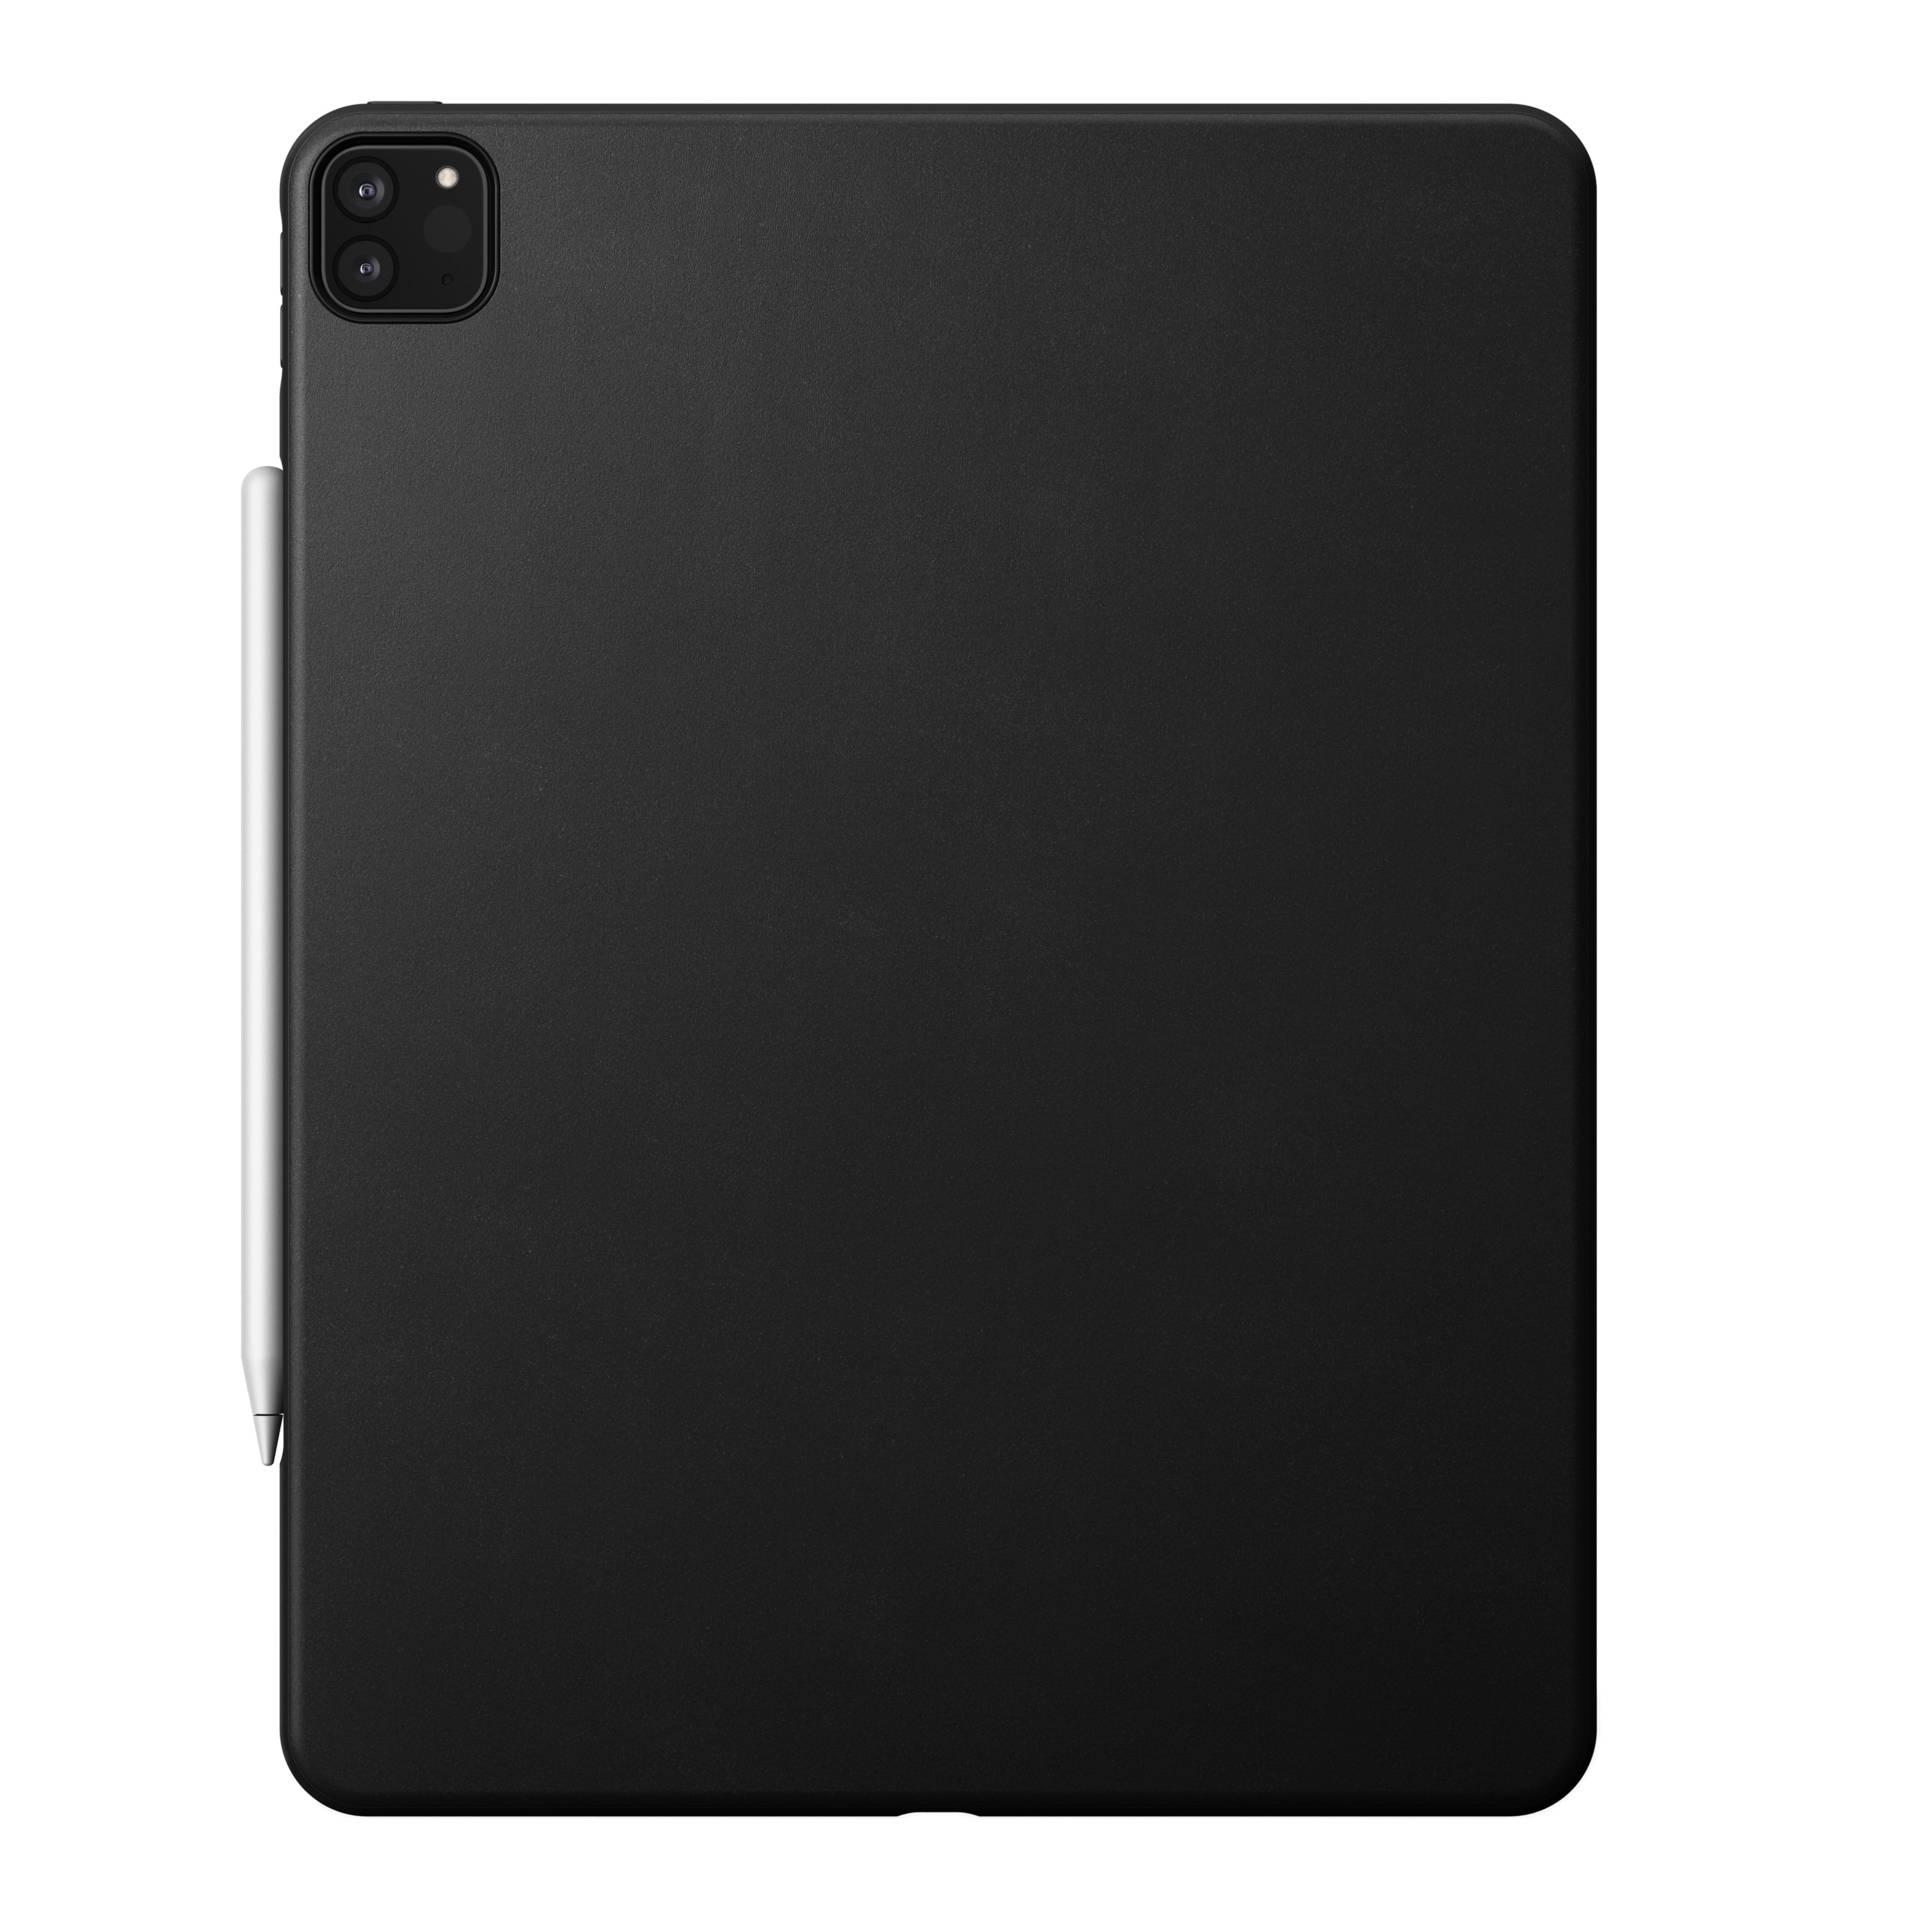 "Nomad Rugged Leather Case für iPad Pro 11"" Black"